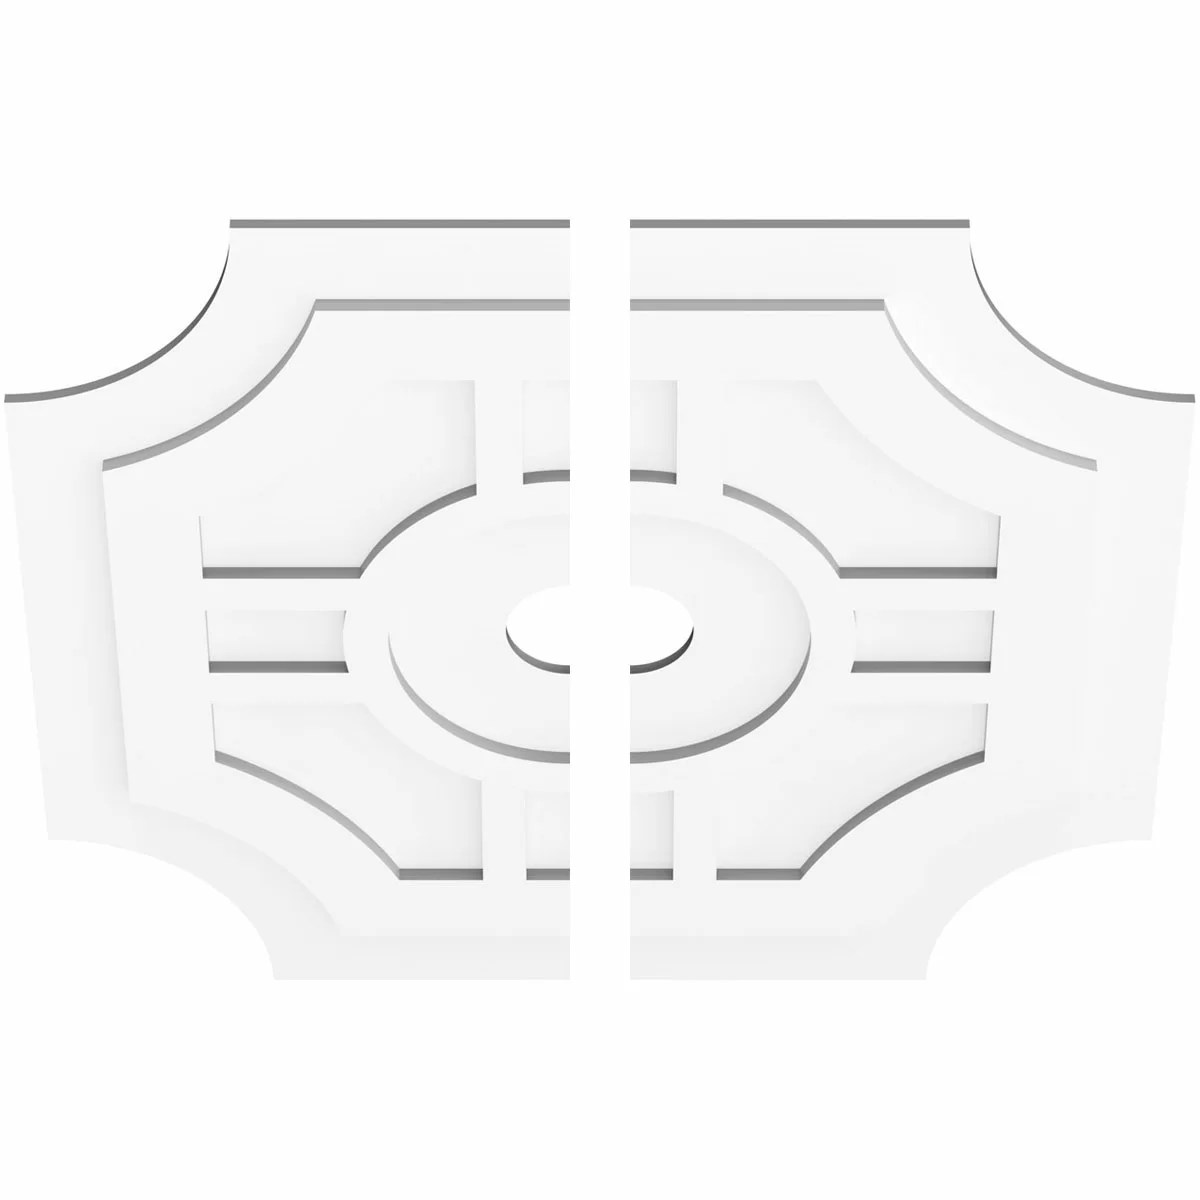 Ekena Millwork Haus Architectural Grade Pvc Ceiling